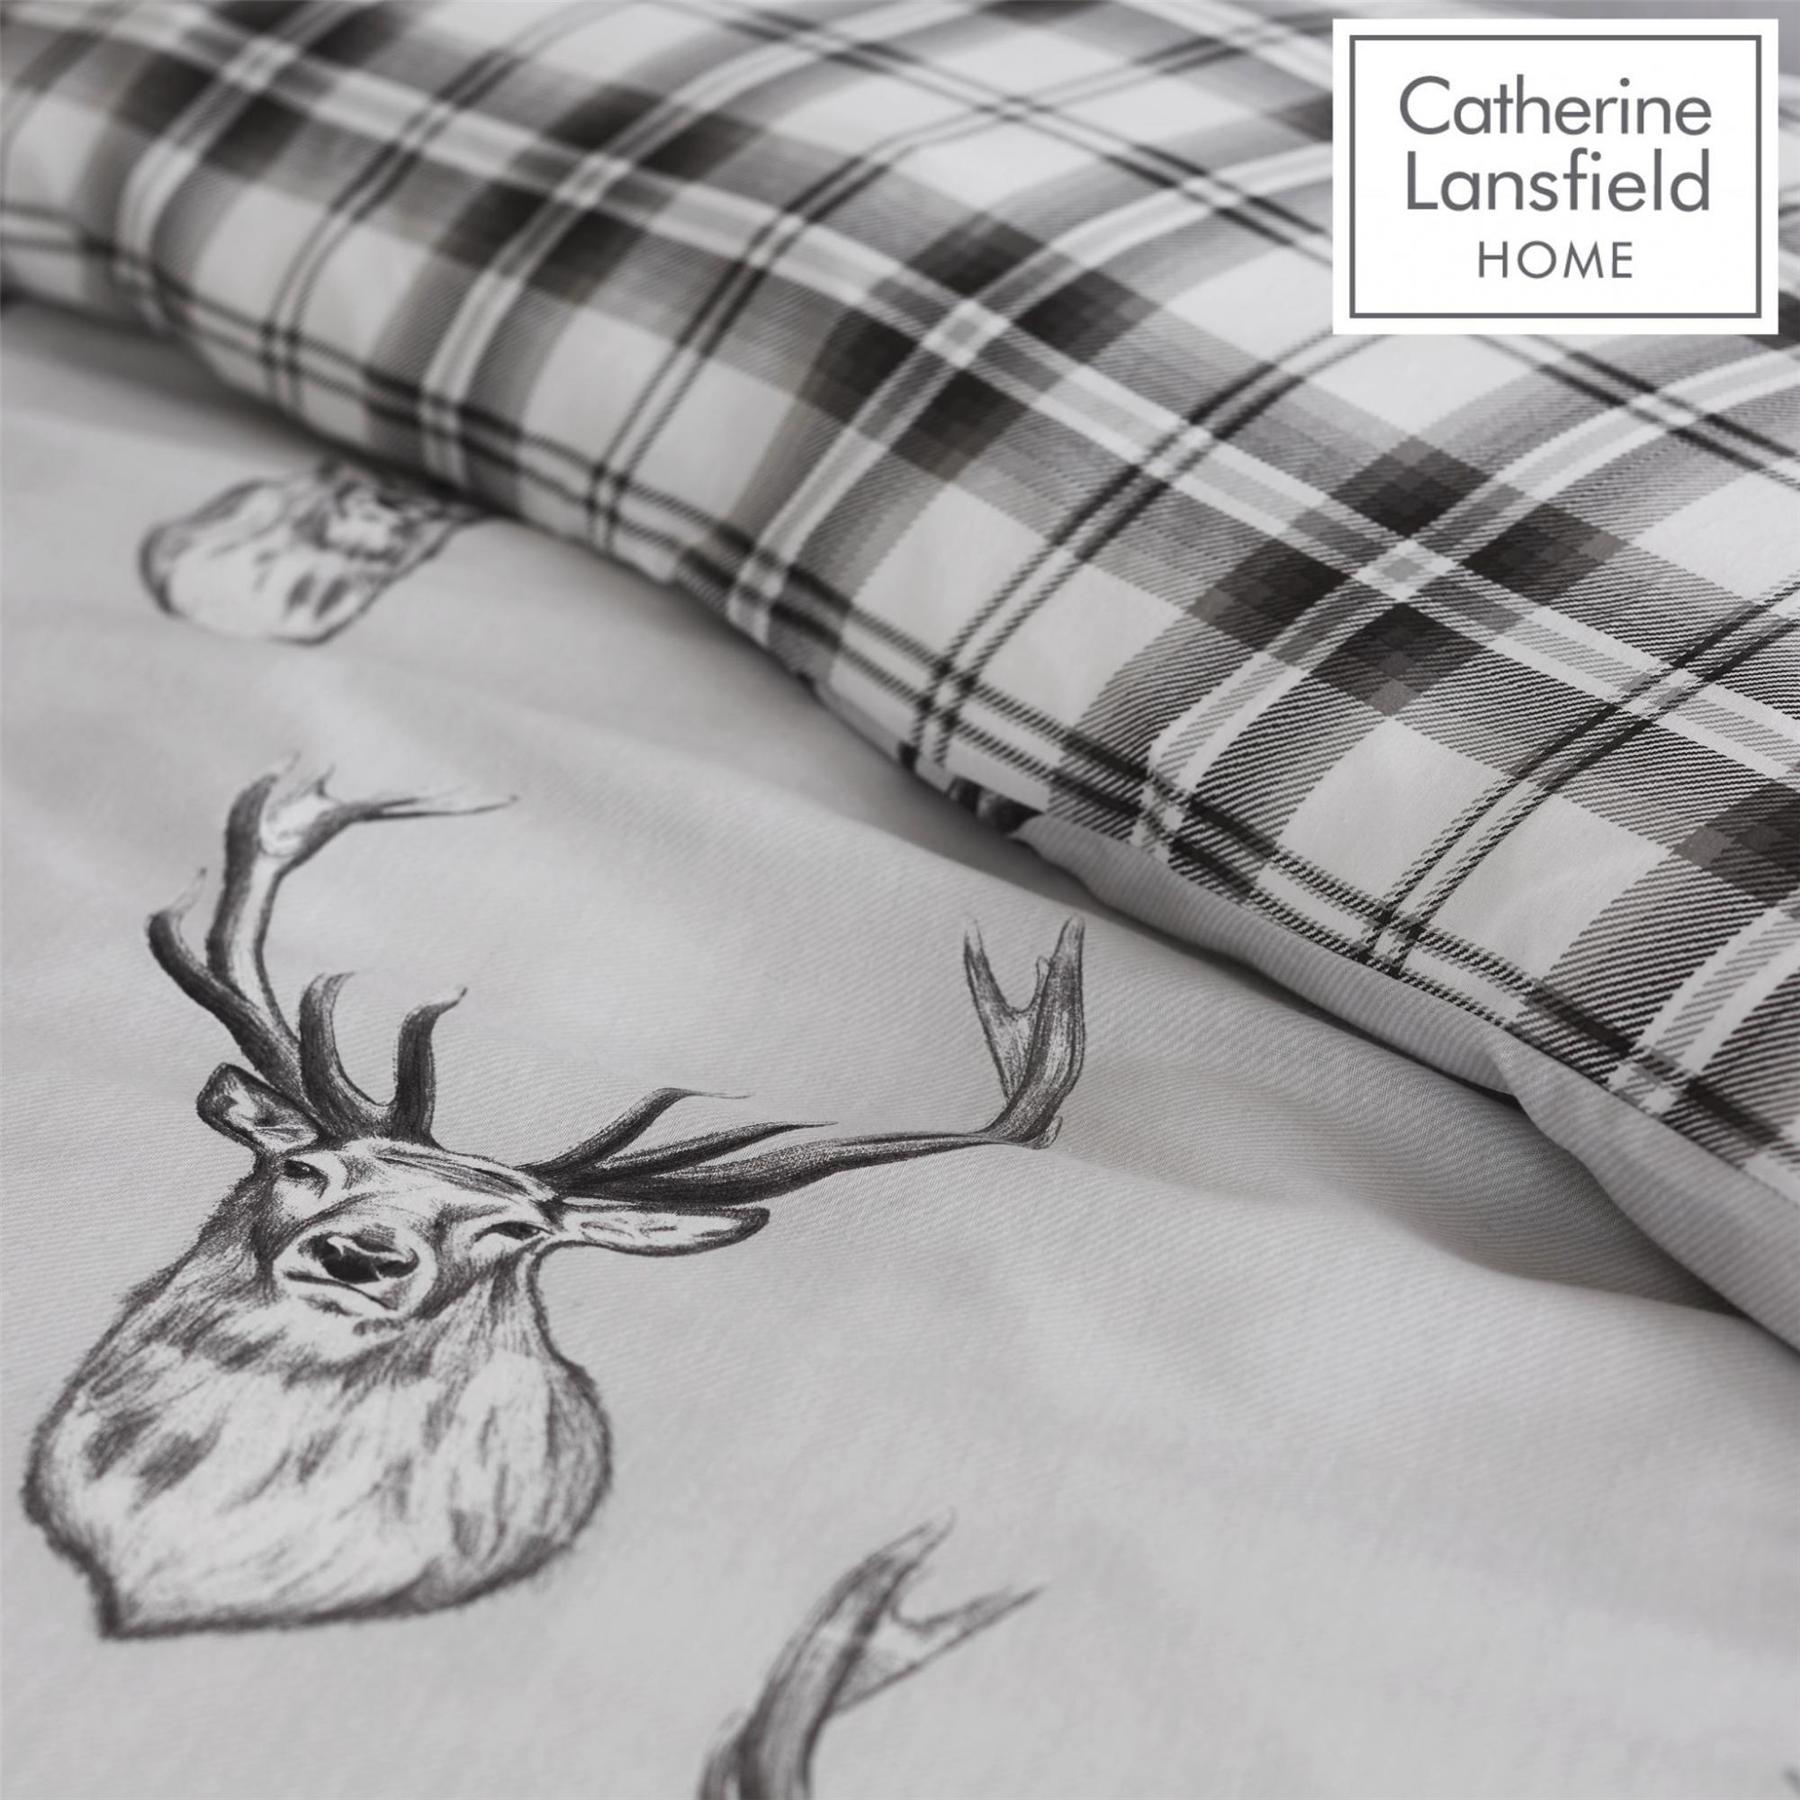 Catherine-Lansfield-Duvet-Set-Highland-Stag-Reversible-Check-Bedding-Grey thumbnail 13